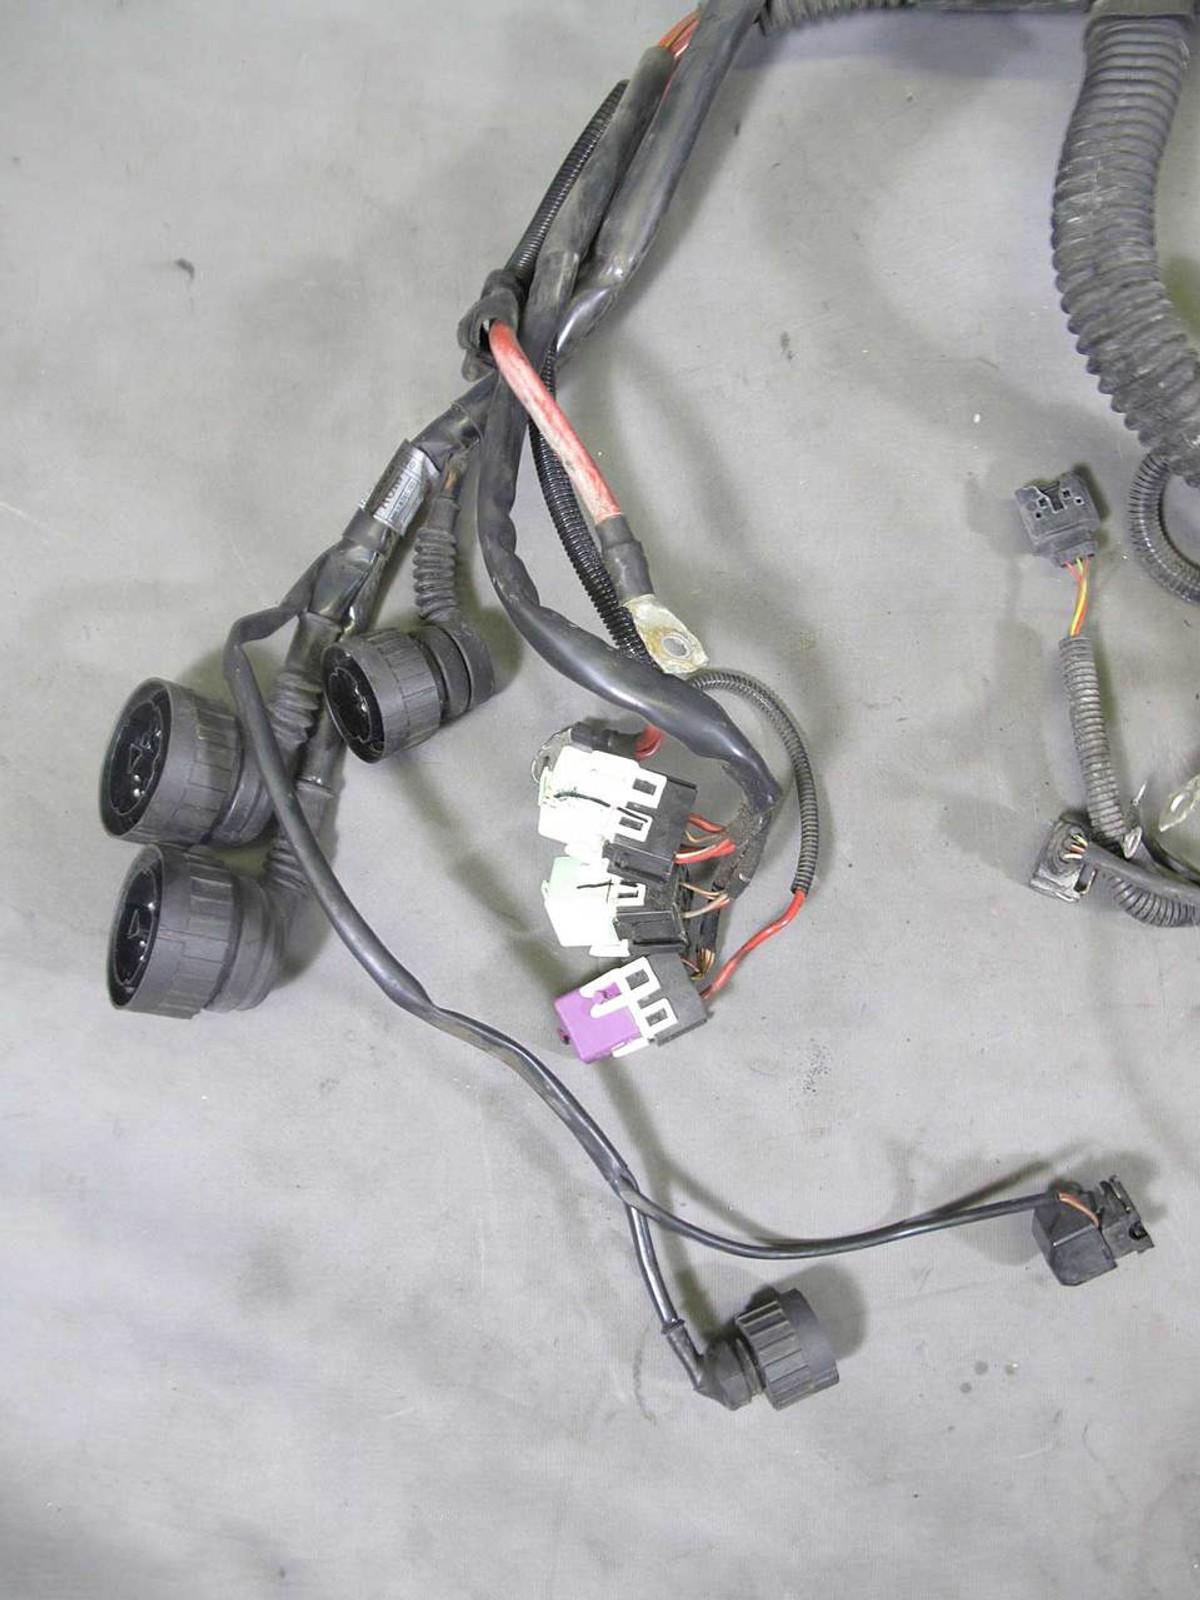 hight resolution of bmw e36 engine wiring harness manual asc t 97 98 99 328i 328is 328ic bmw e36 m50 engine wiring harness bmw e36 engine wiring harness